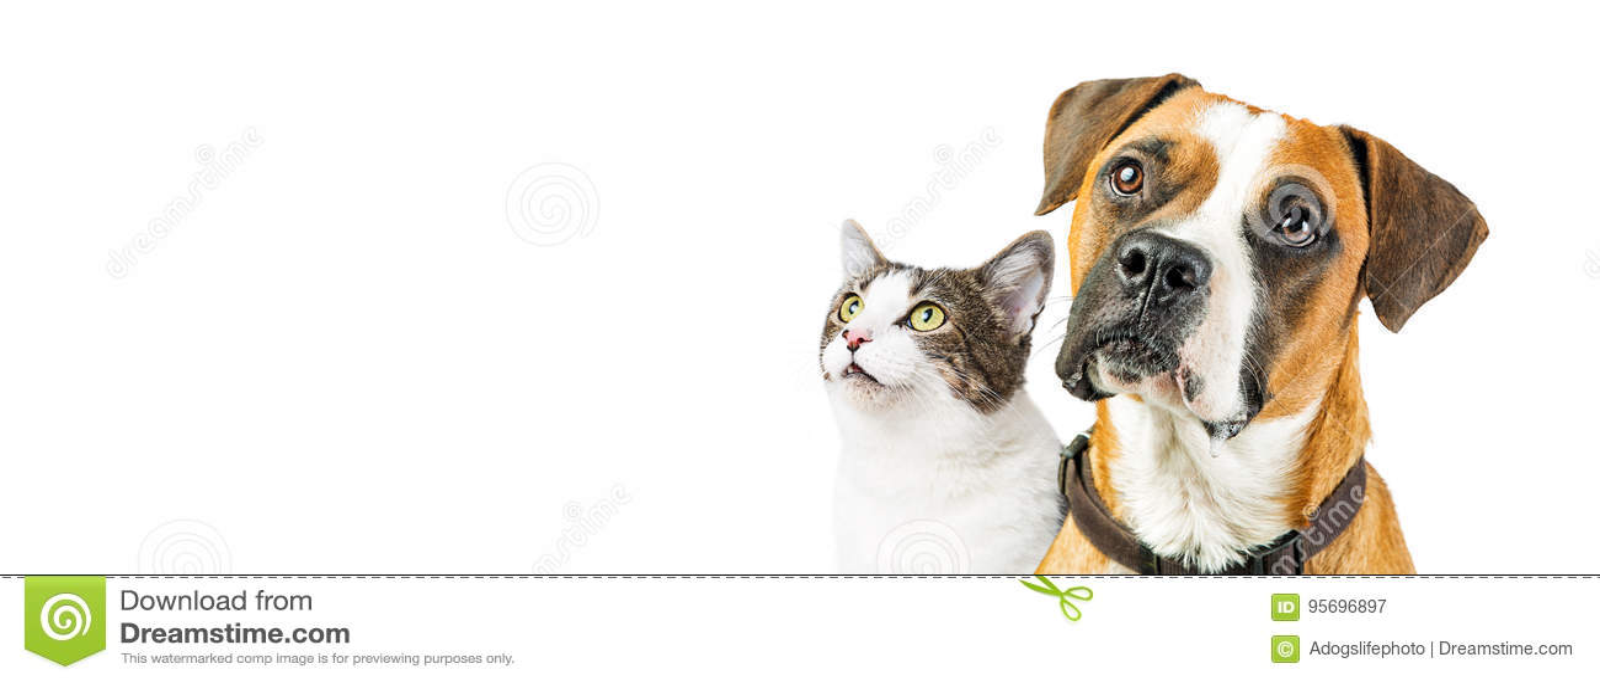 Hond en Cat Together op Witte Horizontale Banner